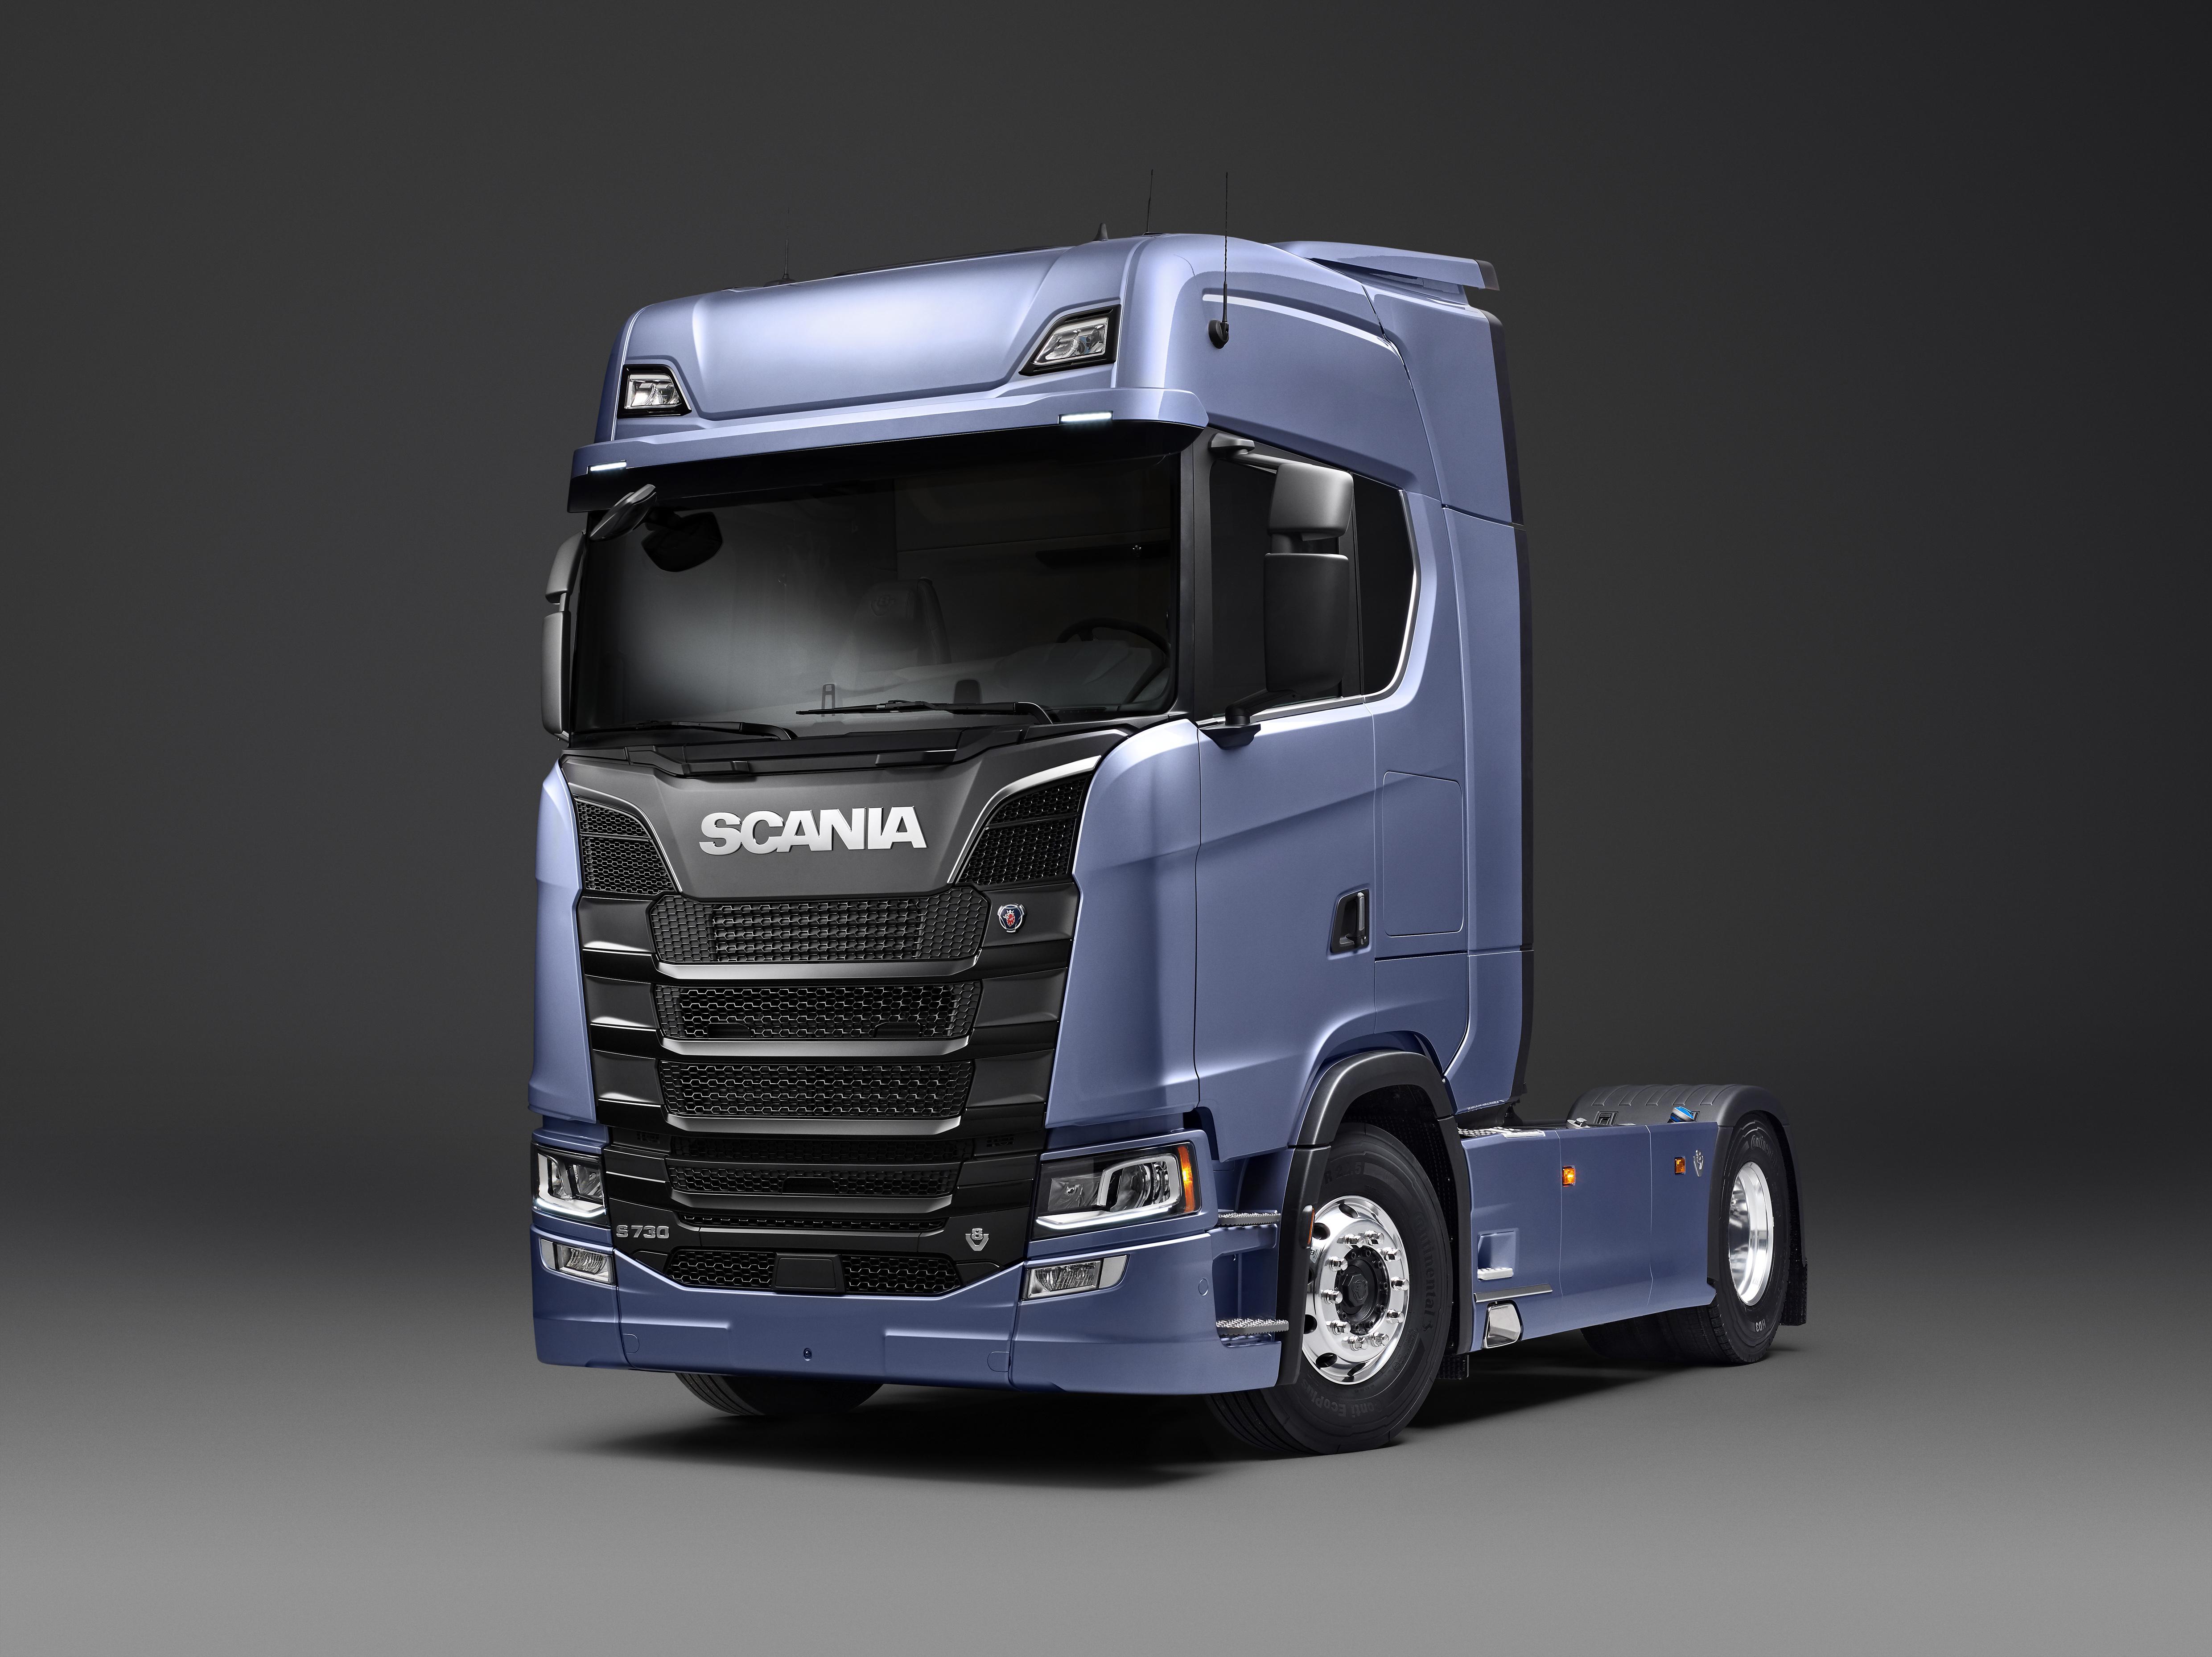 Scania truck photo